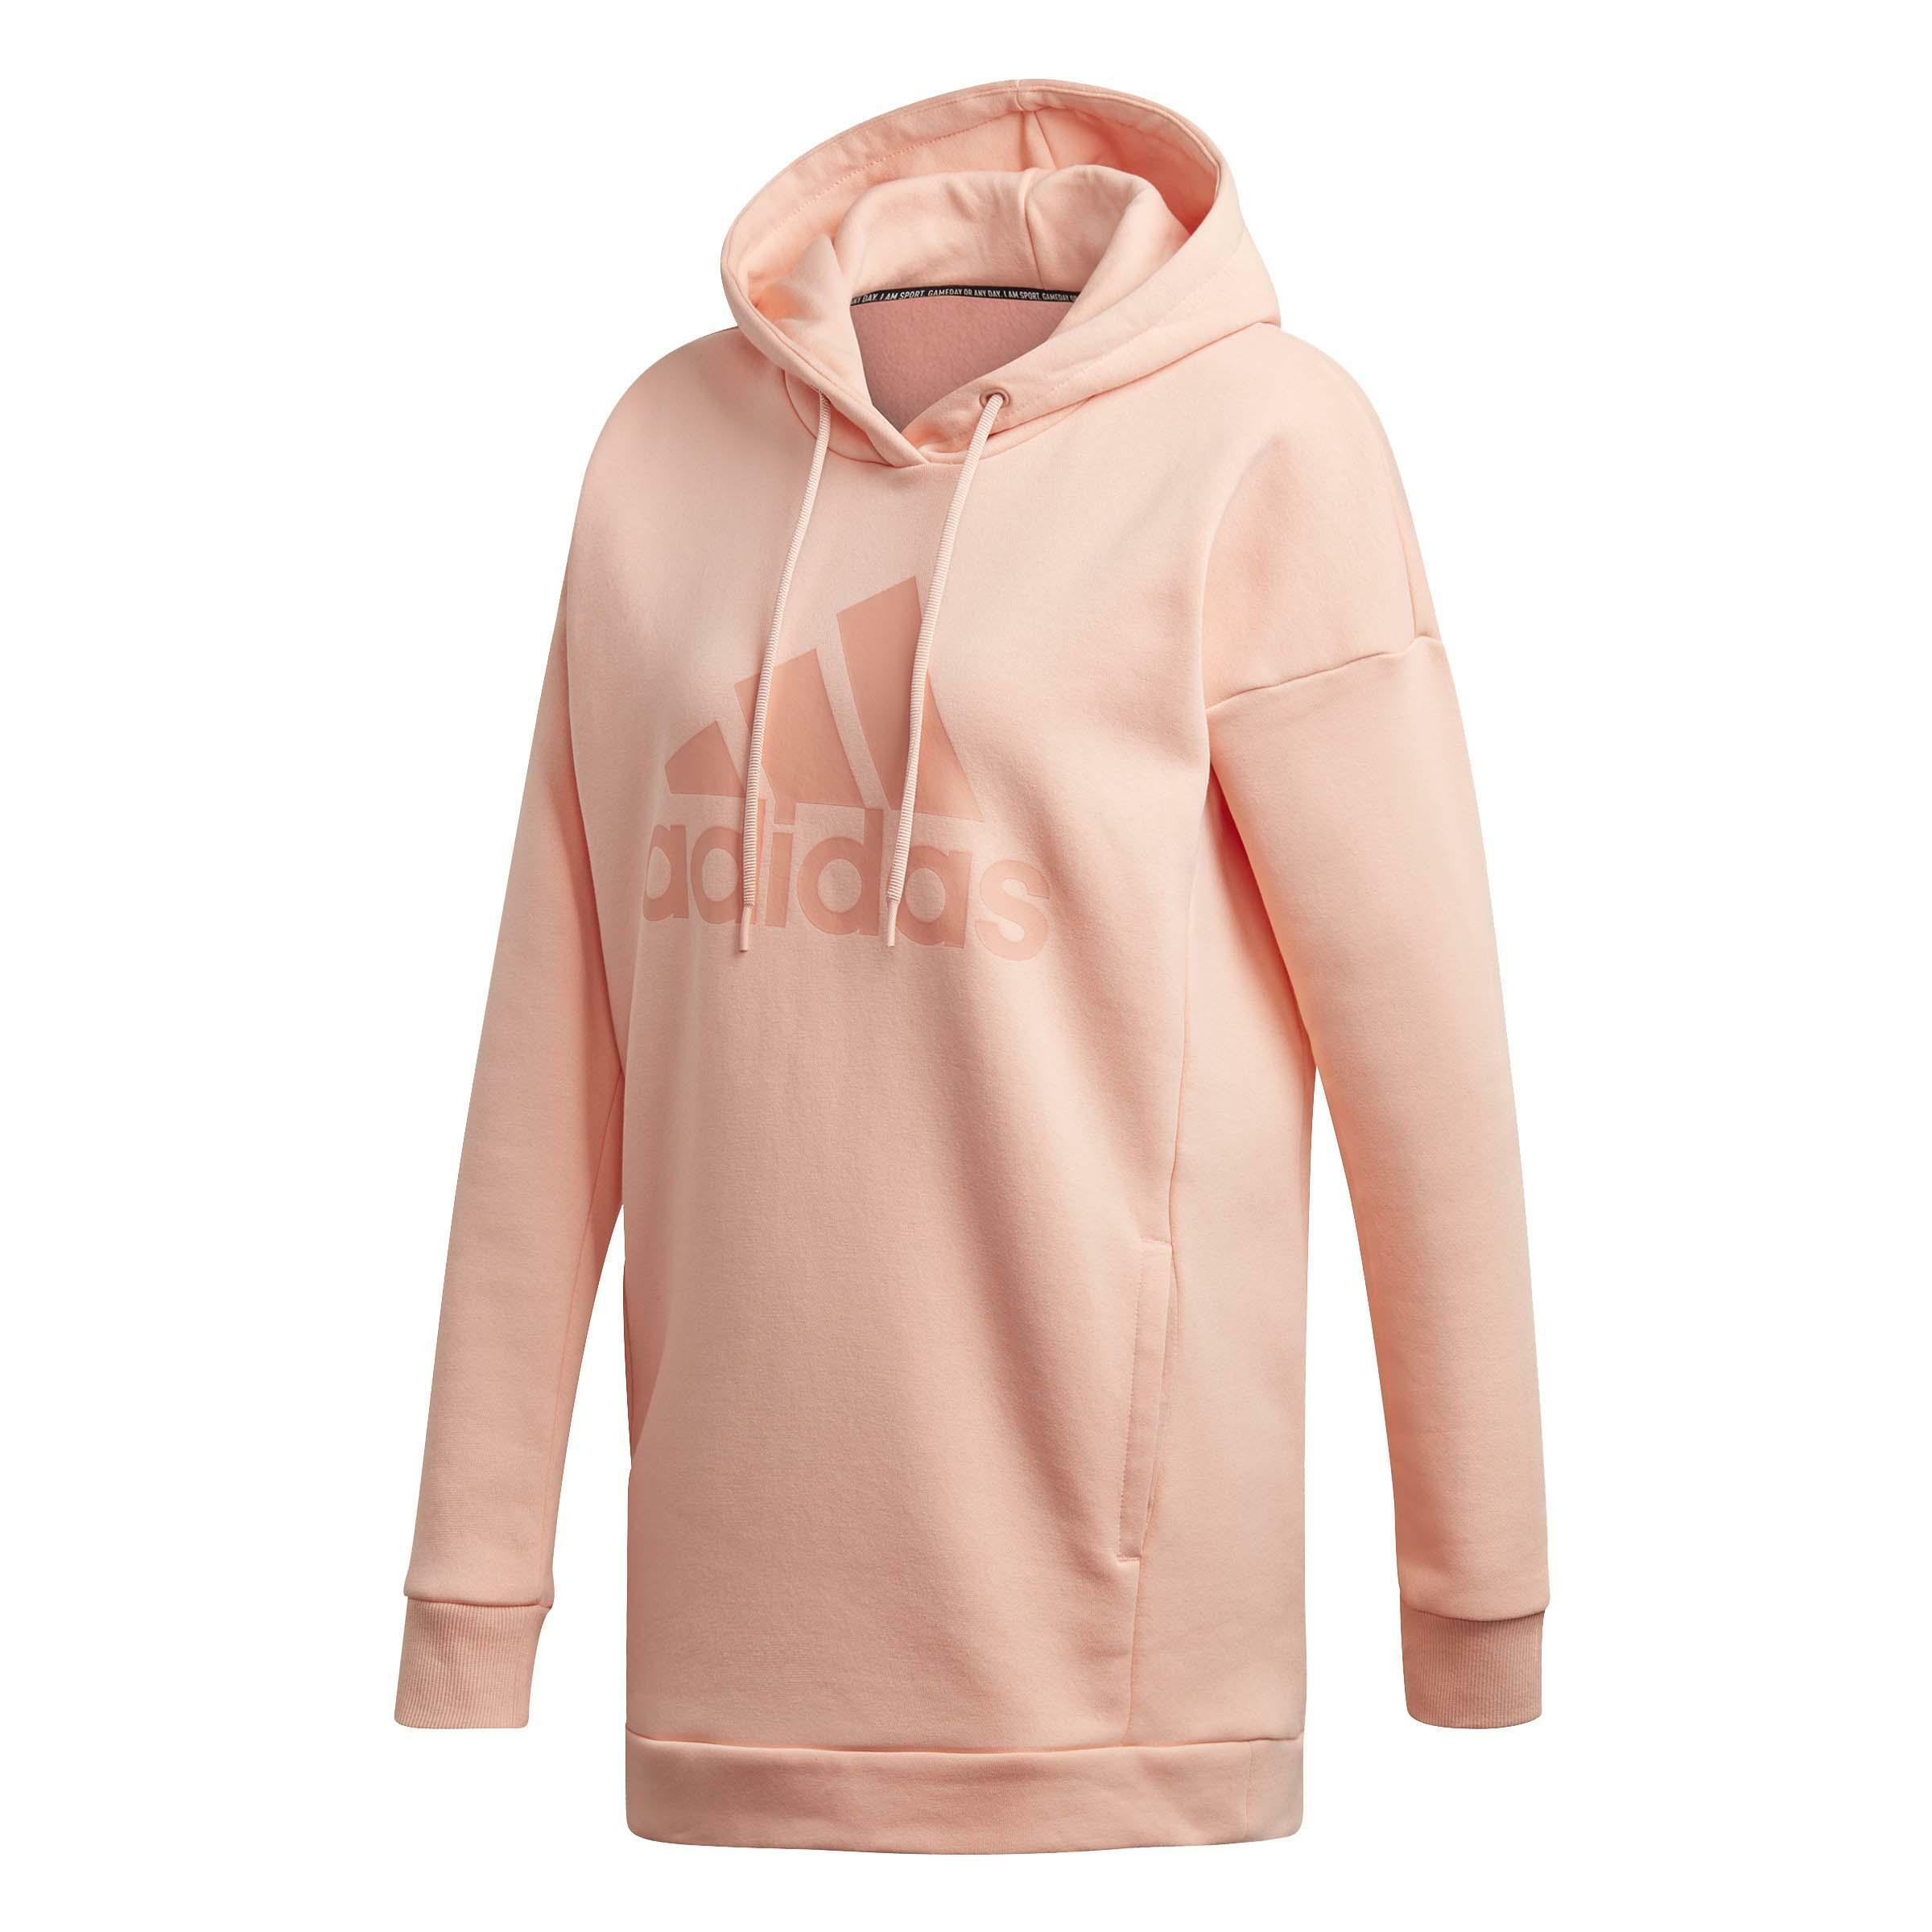 adidas adidas must have bos hd felpa donna rosa dx7964